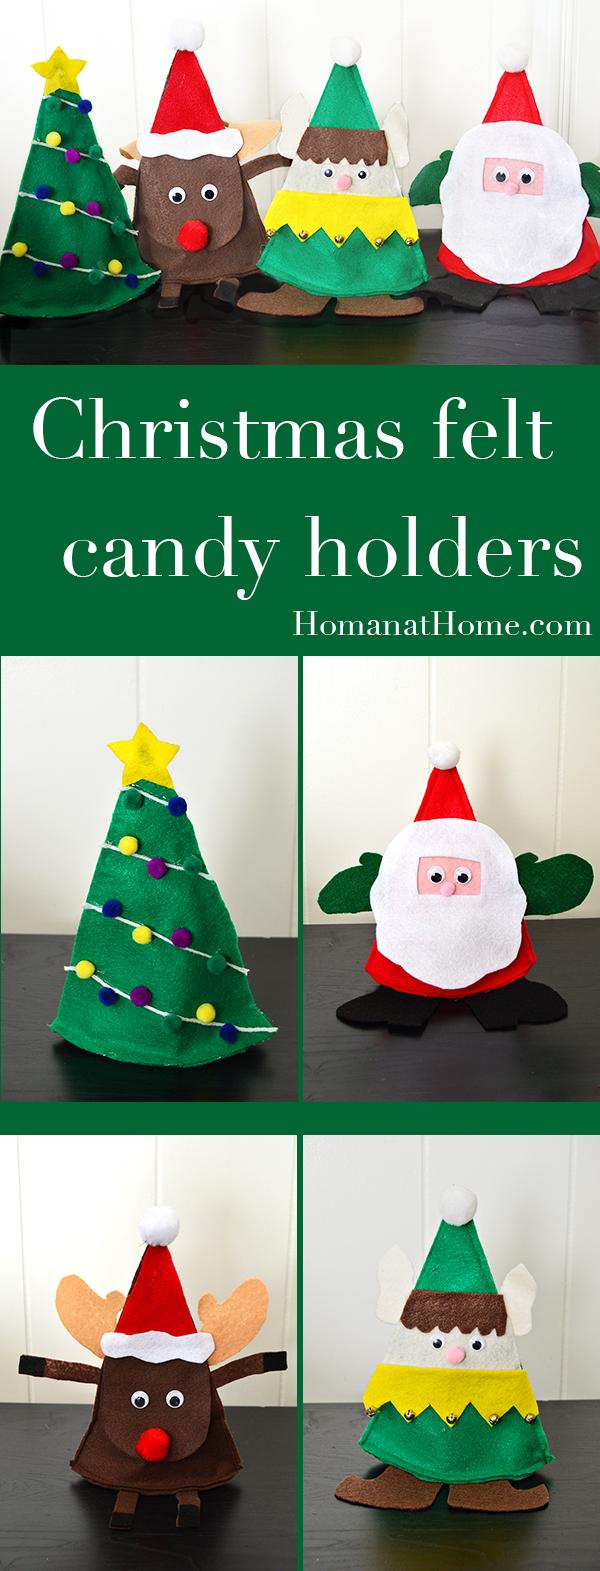 Christmas Felt Candy Holders | Homan at Home